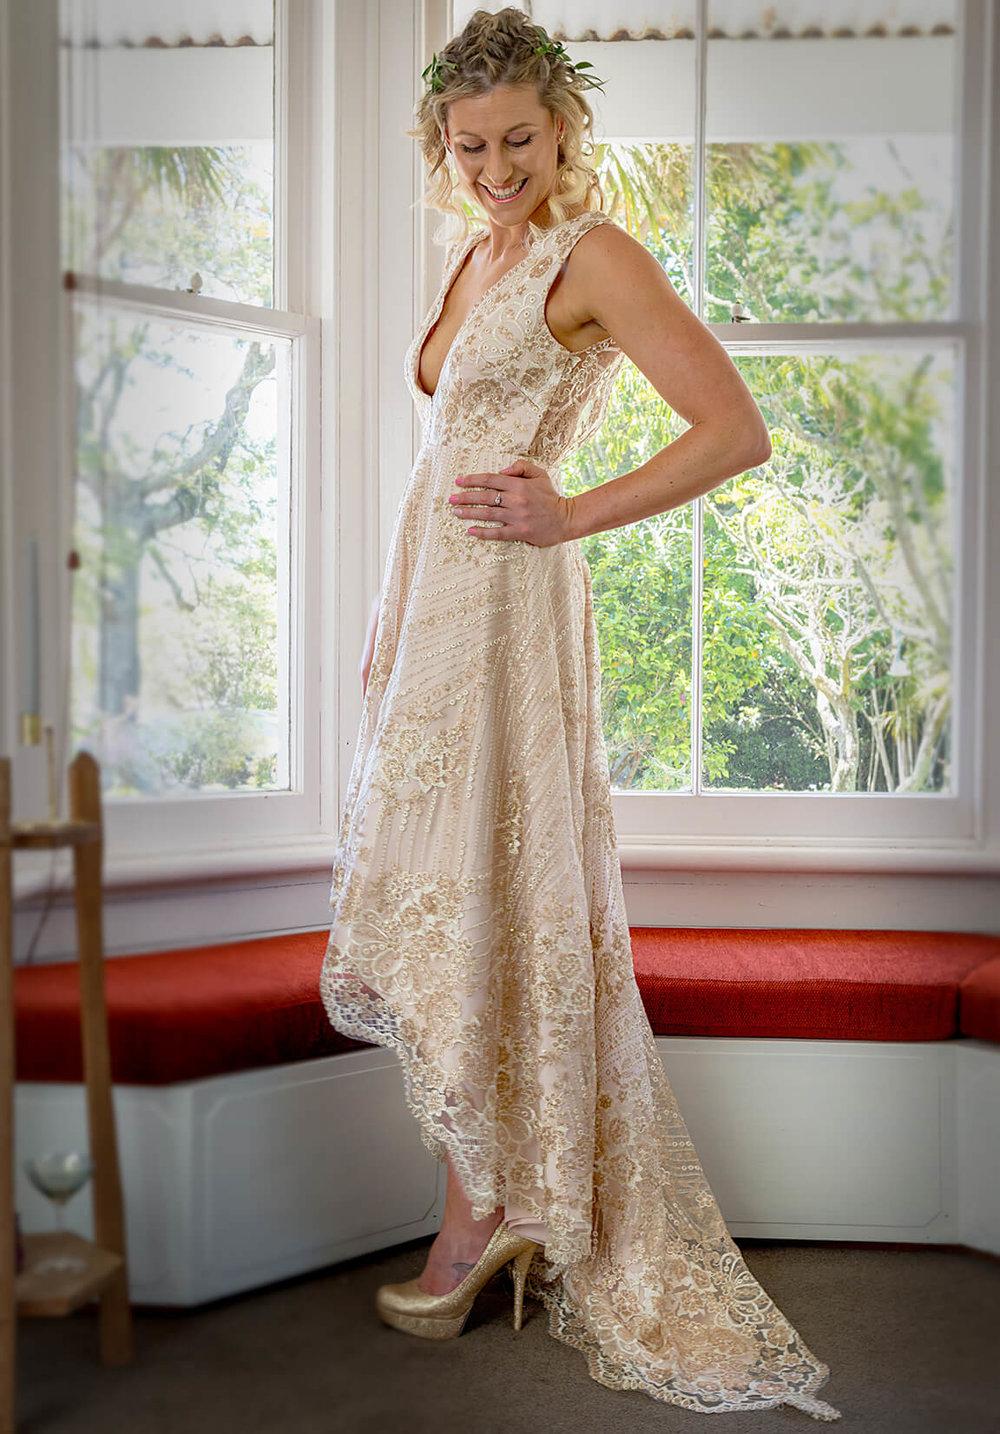 elizabeth may bridal honour collection 2.jpg